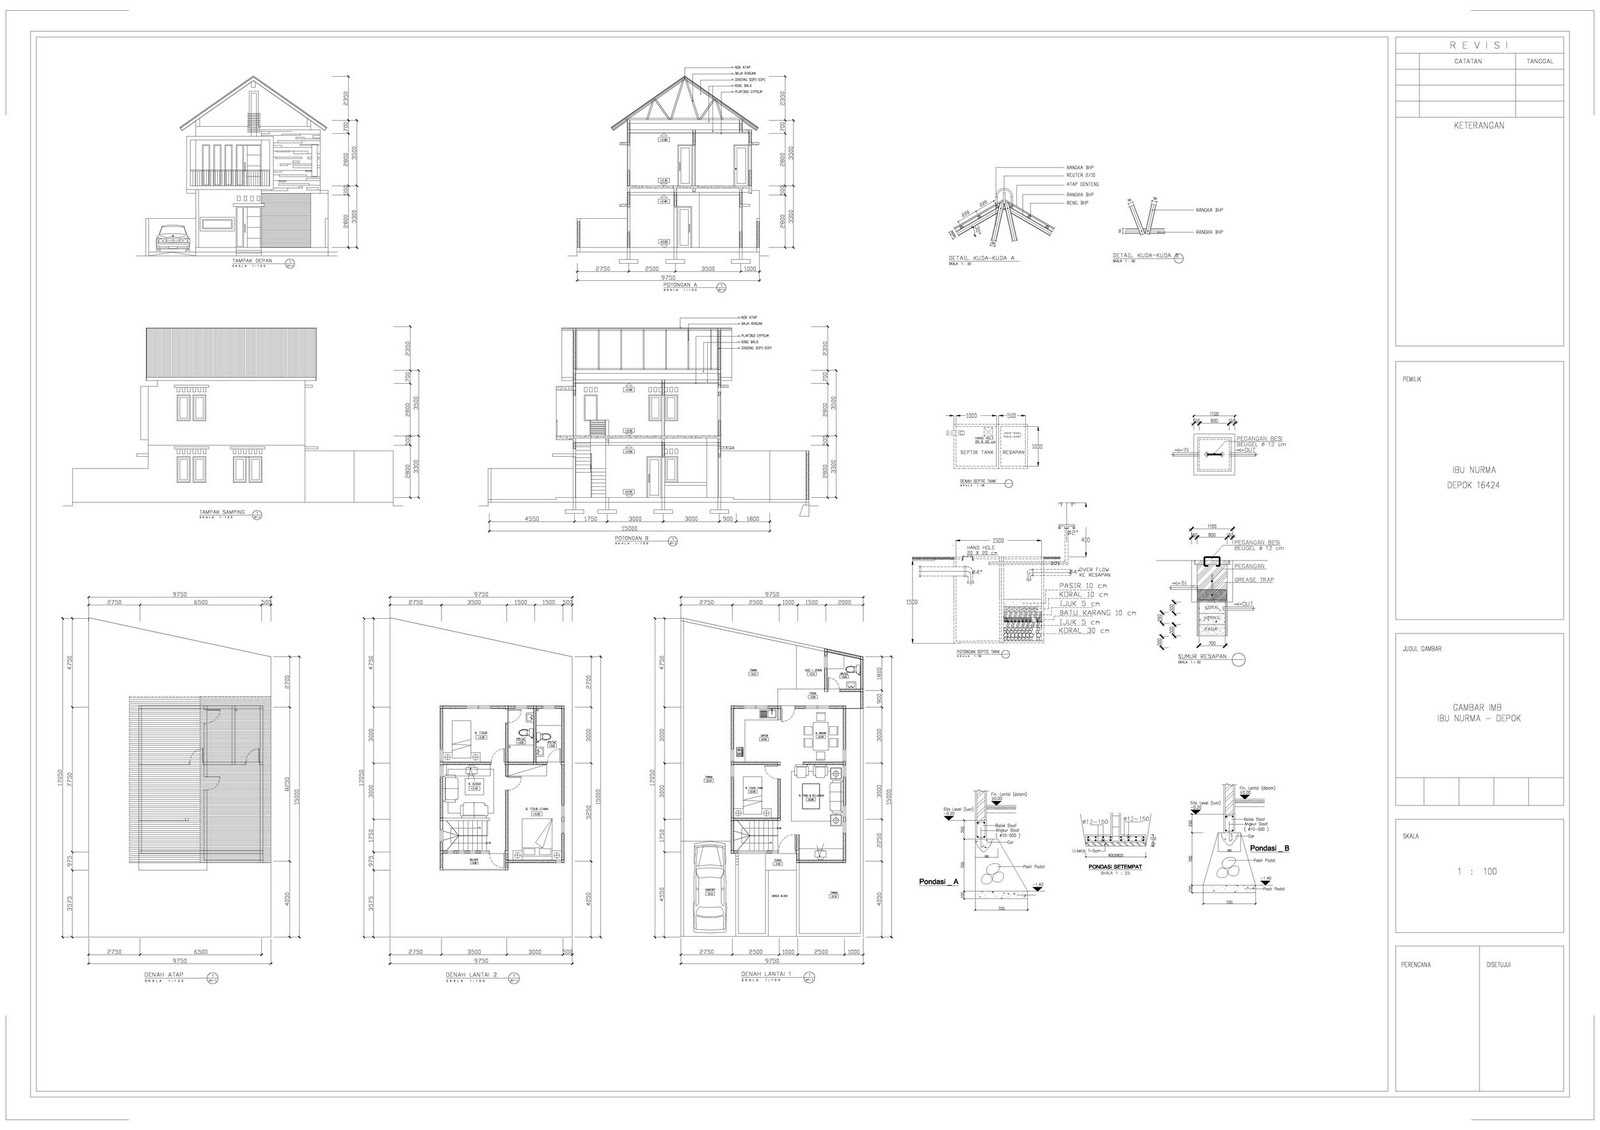 Potongan Rumah Minimalis 2 Lantai Auto Electrical Wiring Diagram